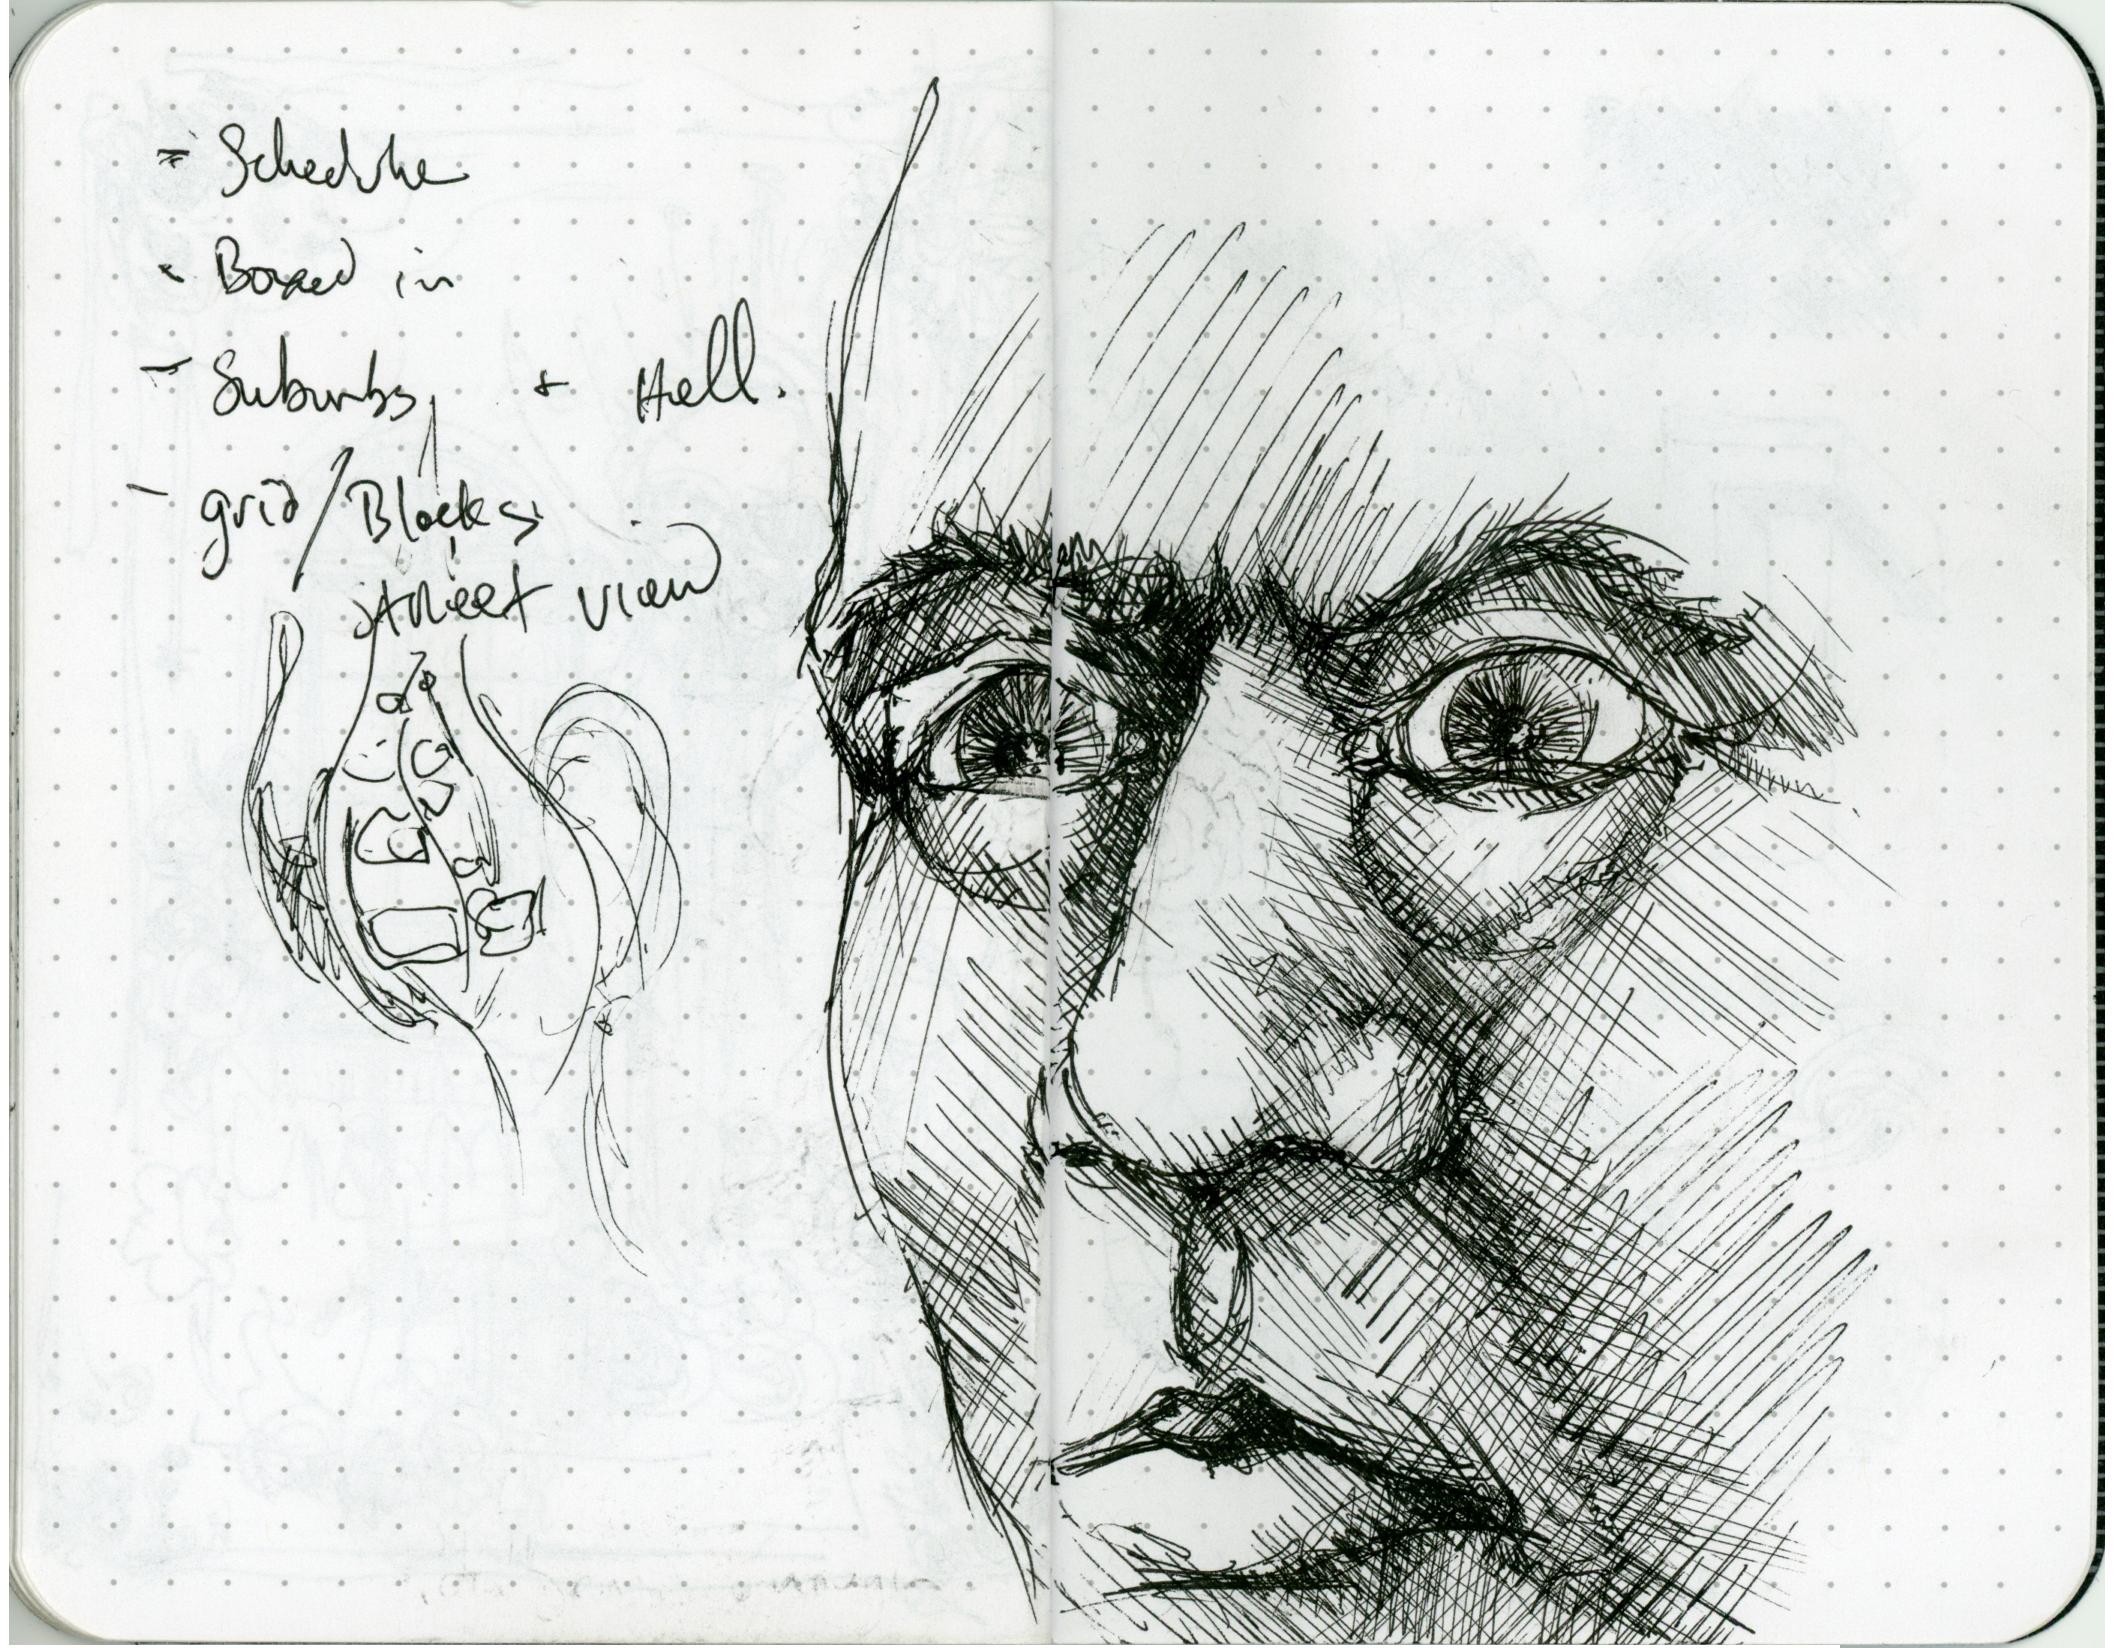 Sketchbook_021_0002_Layer-13.png